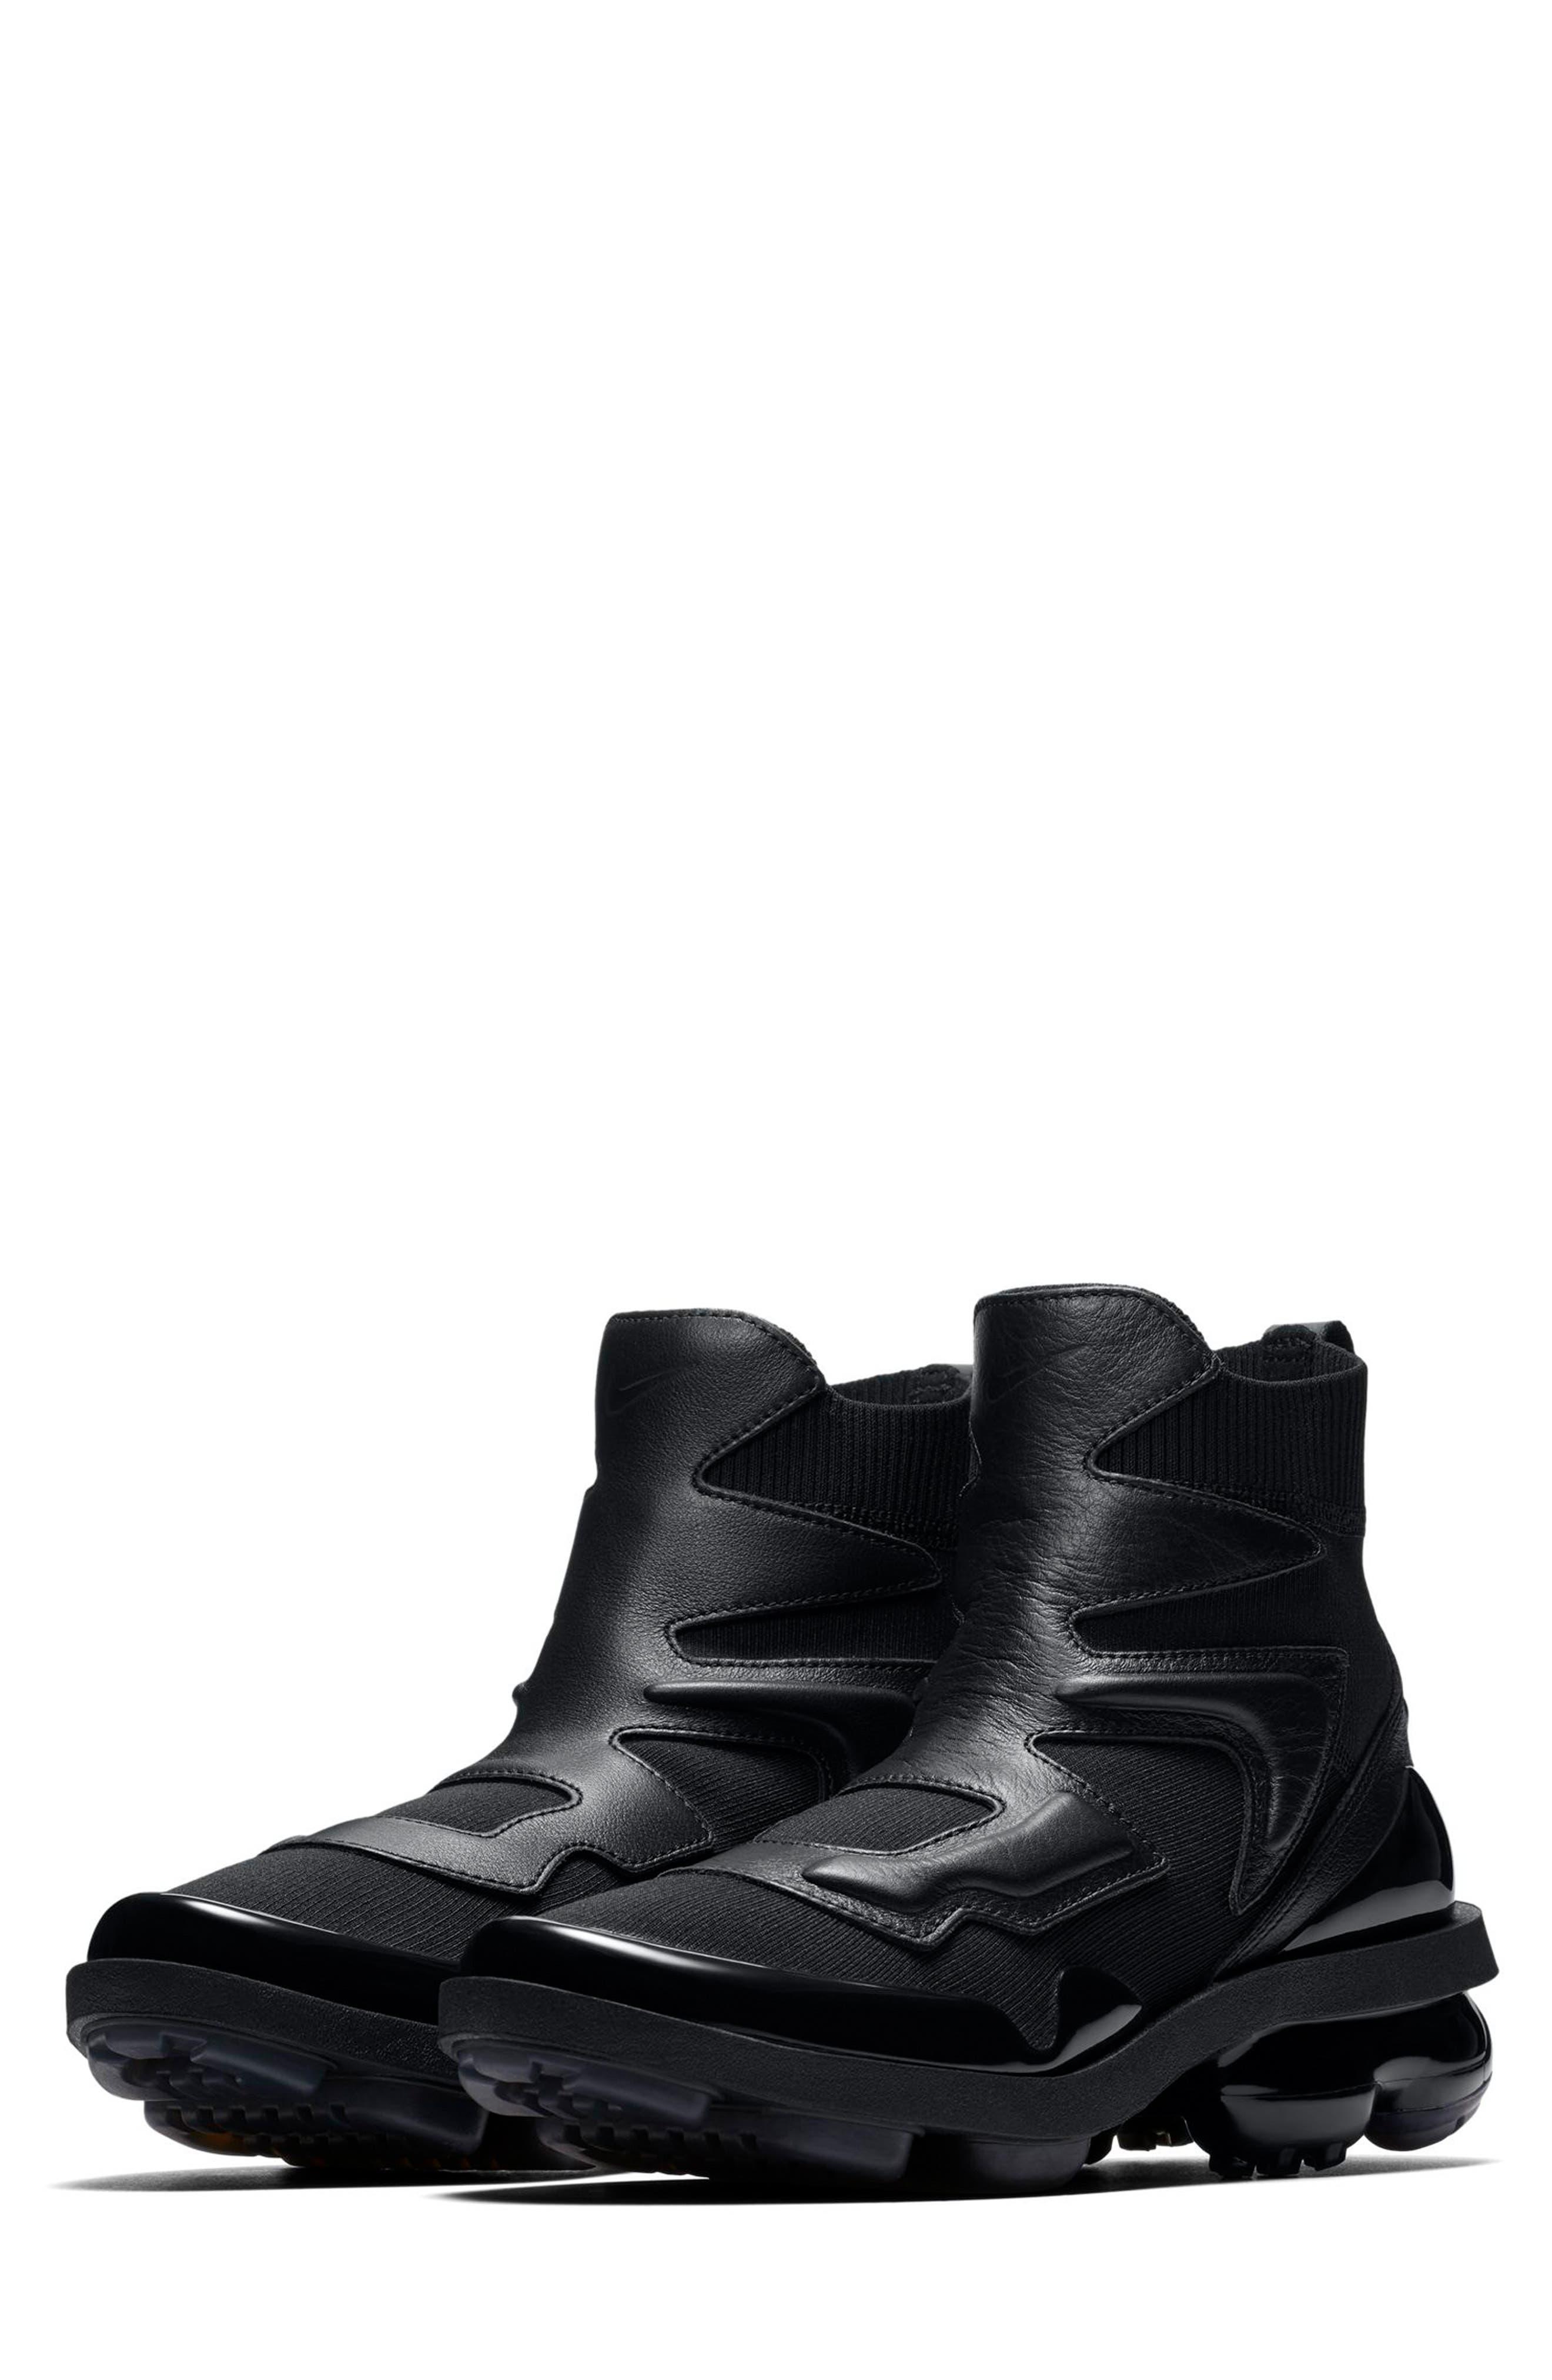 Air Vapormax Light II Sneaker,                             Main thumbnail 1, color,                             BLACK/ BLACK